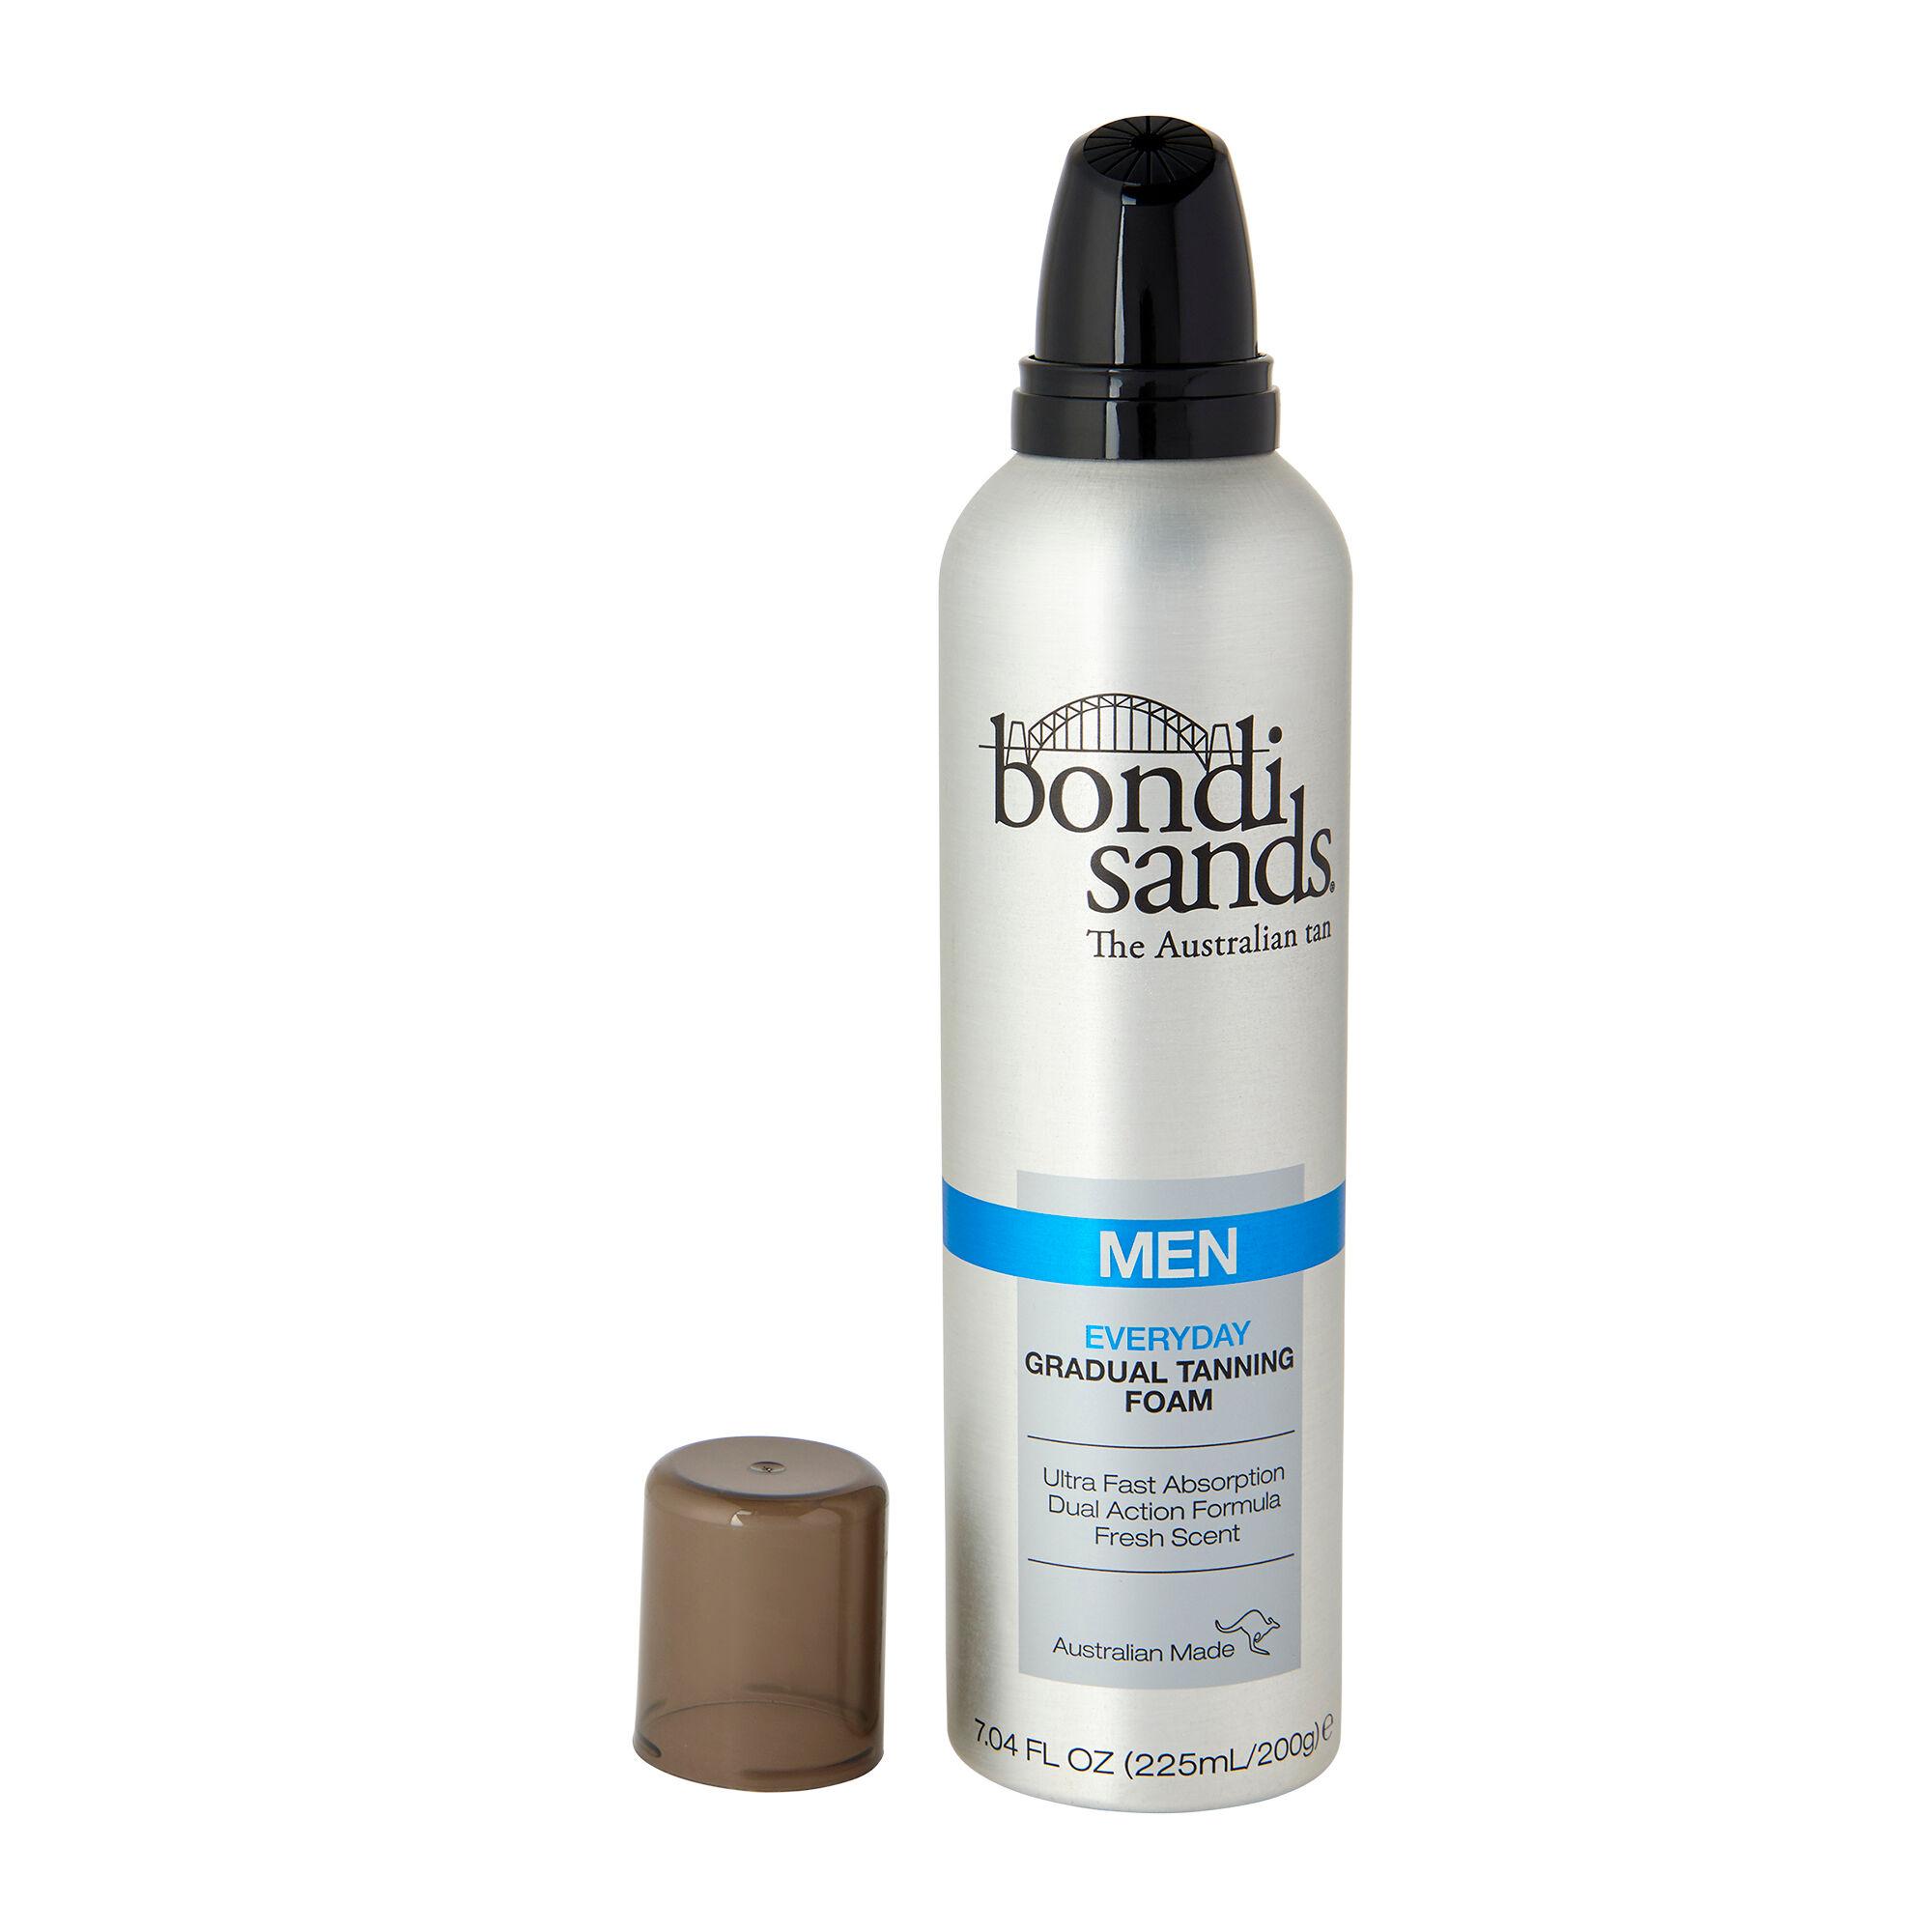 Bondi Sands Everyday Gradual Tanning Foam for Men 225ml